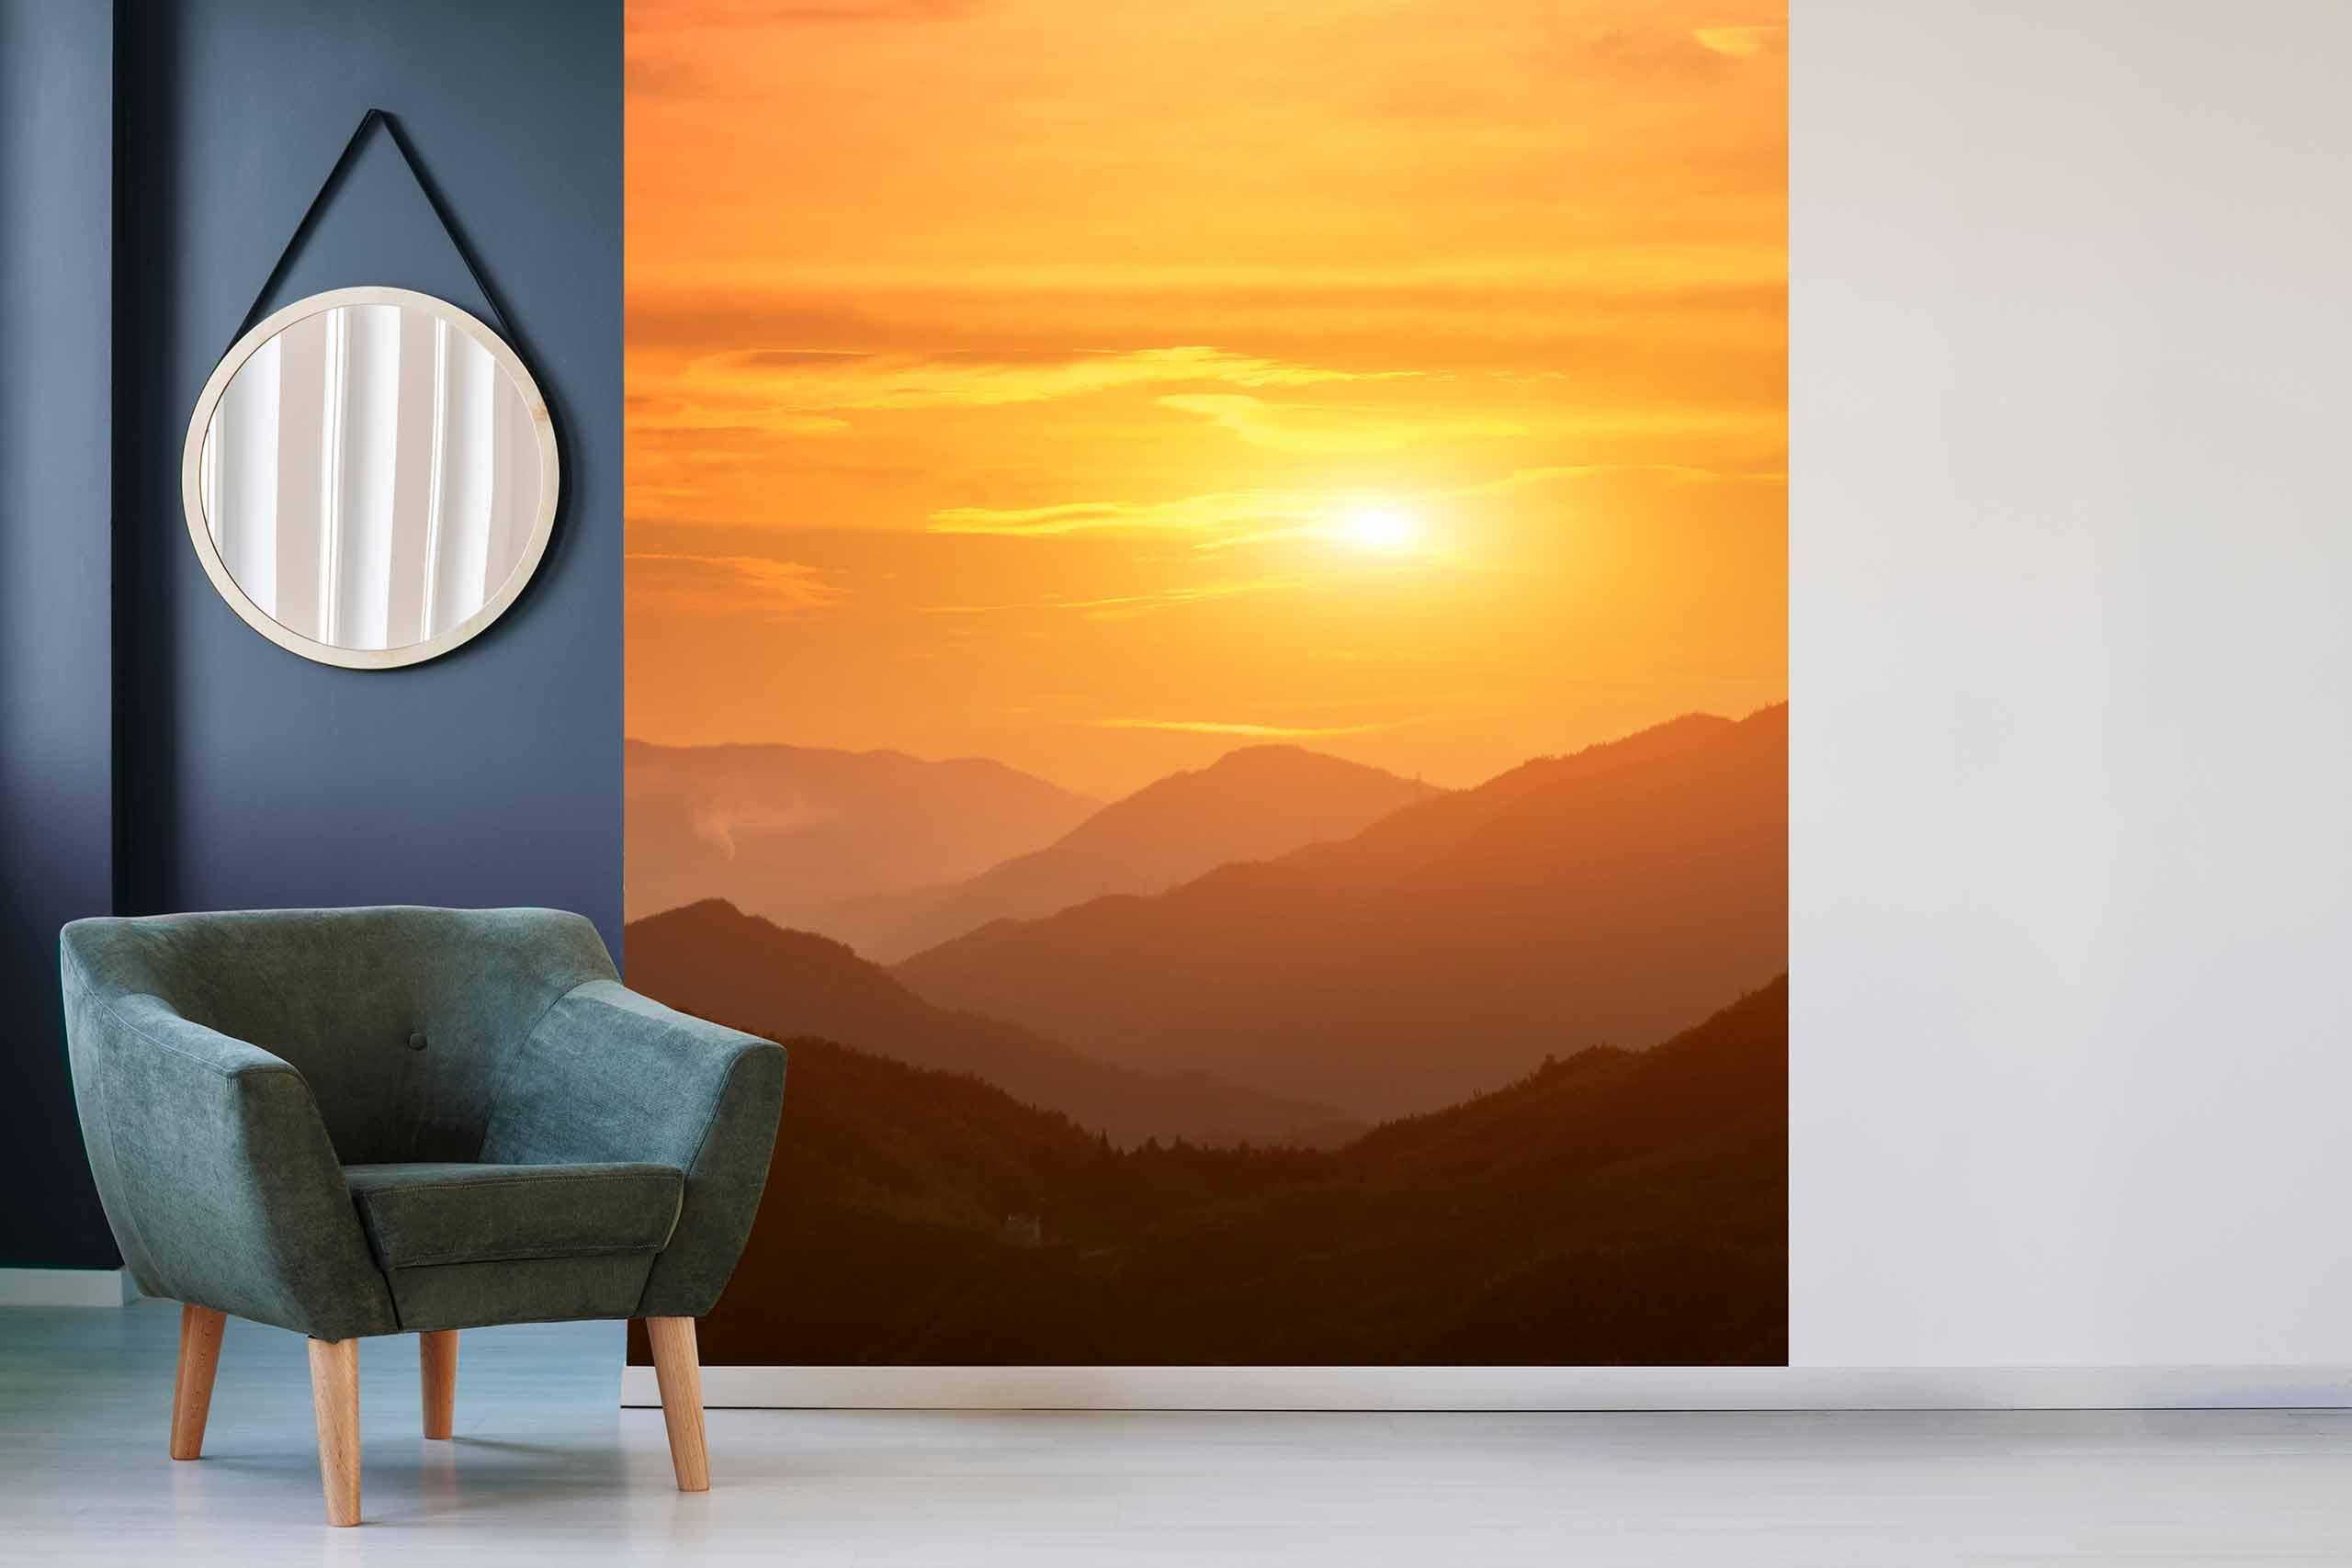 Vlies Tapete 225 Fototapete Höhe 250cm Motiv 11 Sonnenaufgang Berge